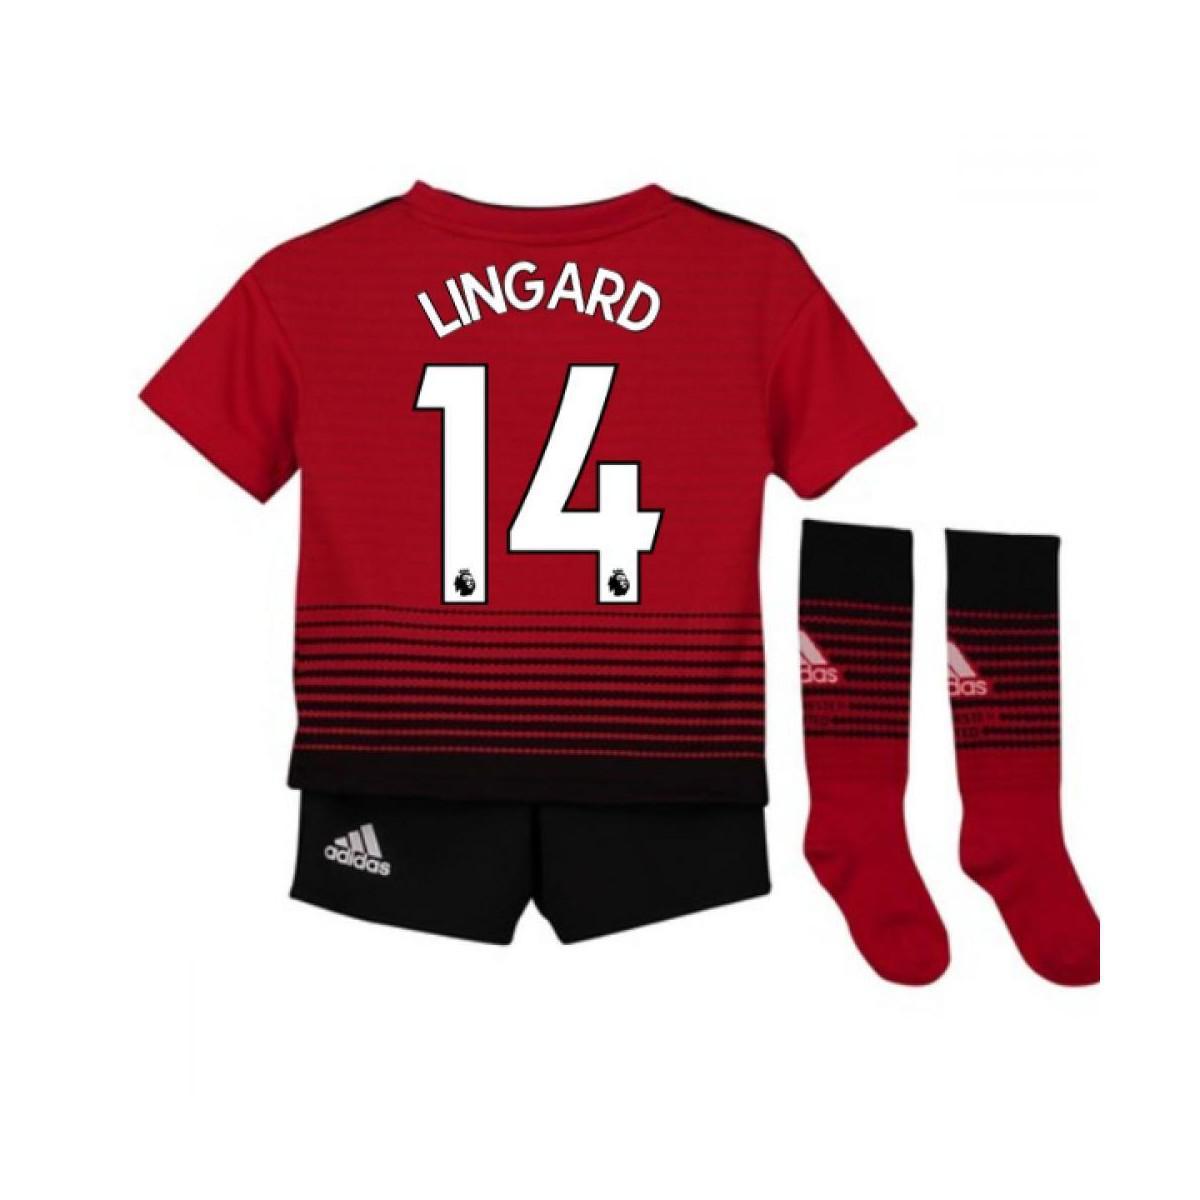 e7fd7976749 Cheapest Man Utd Shirt 2014 - Cotswold Hire